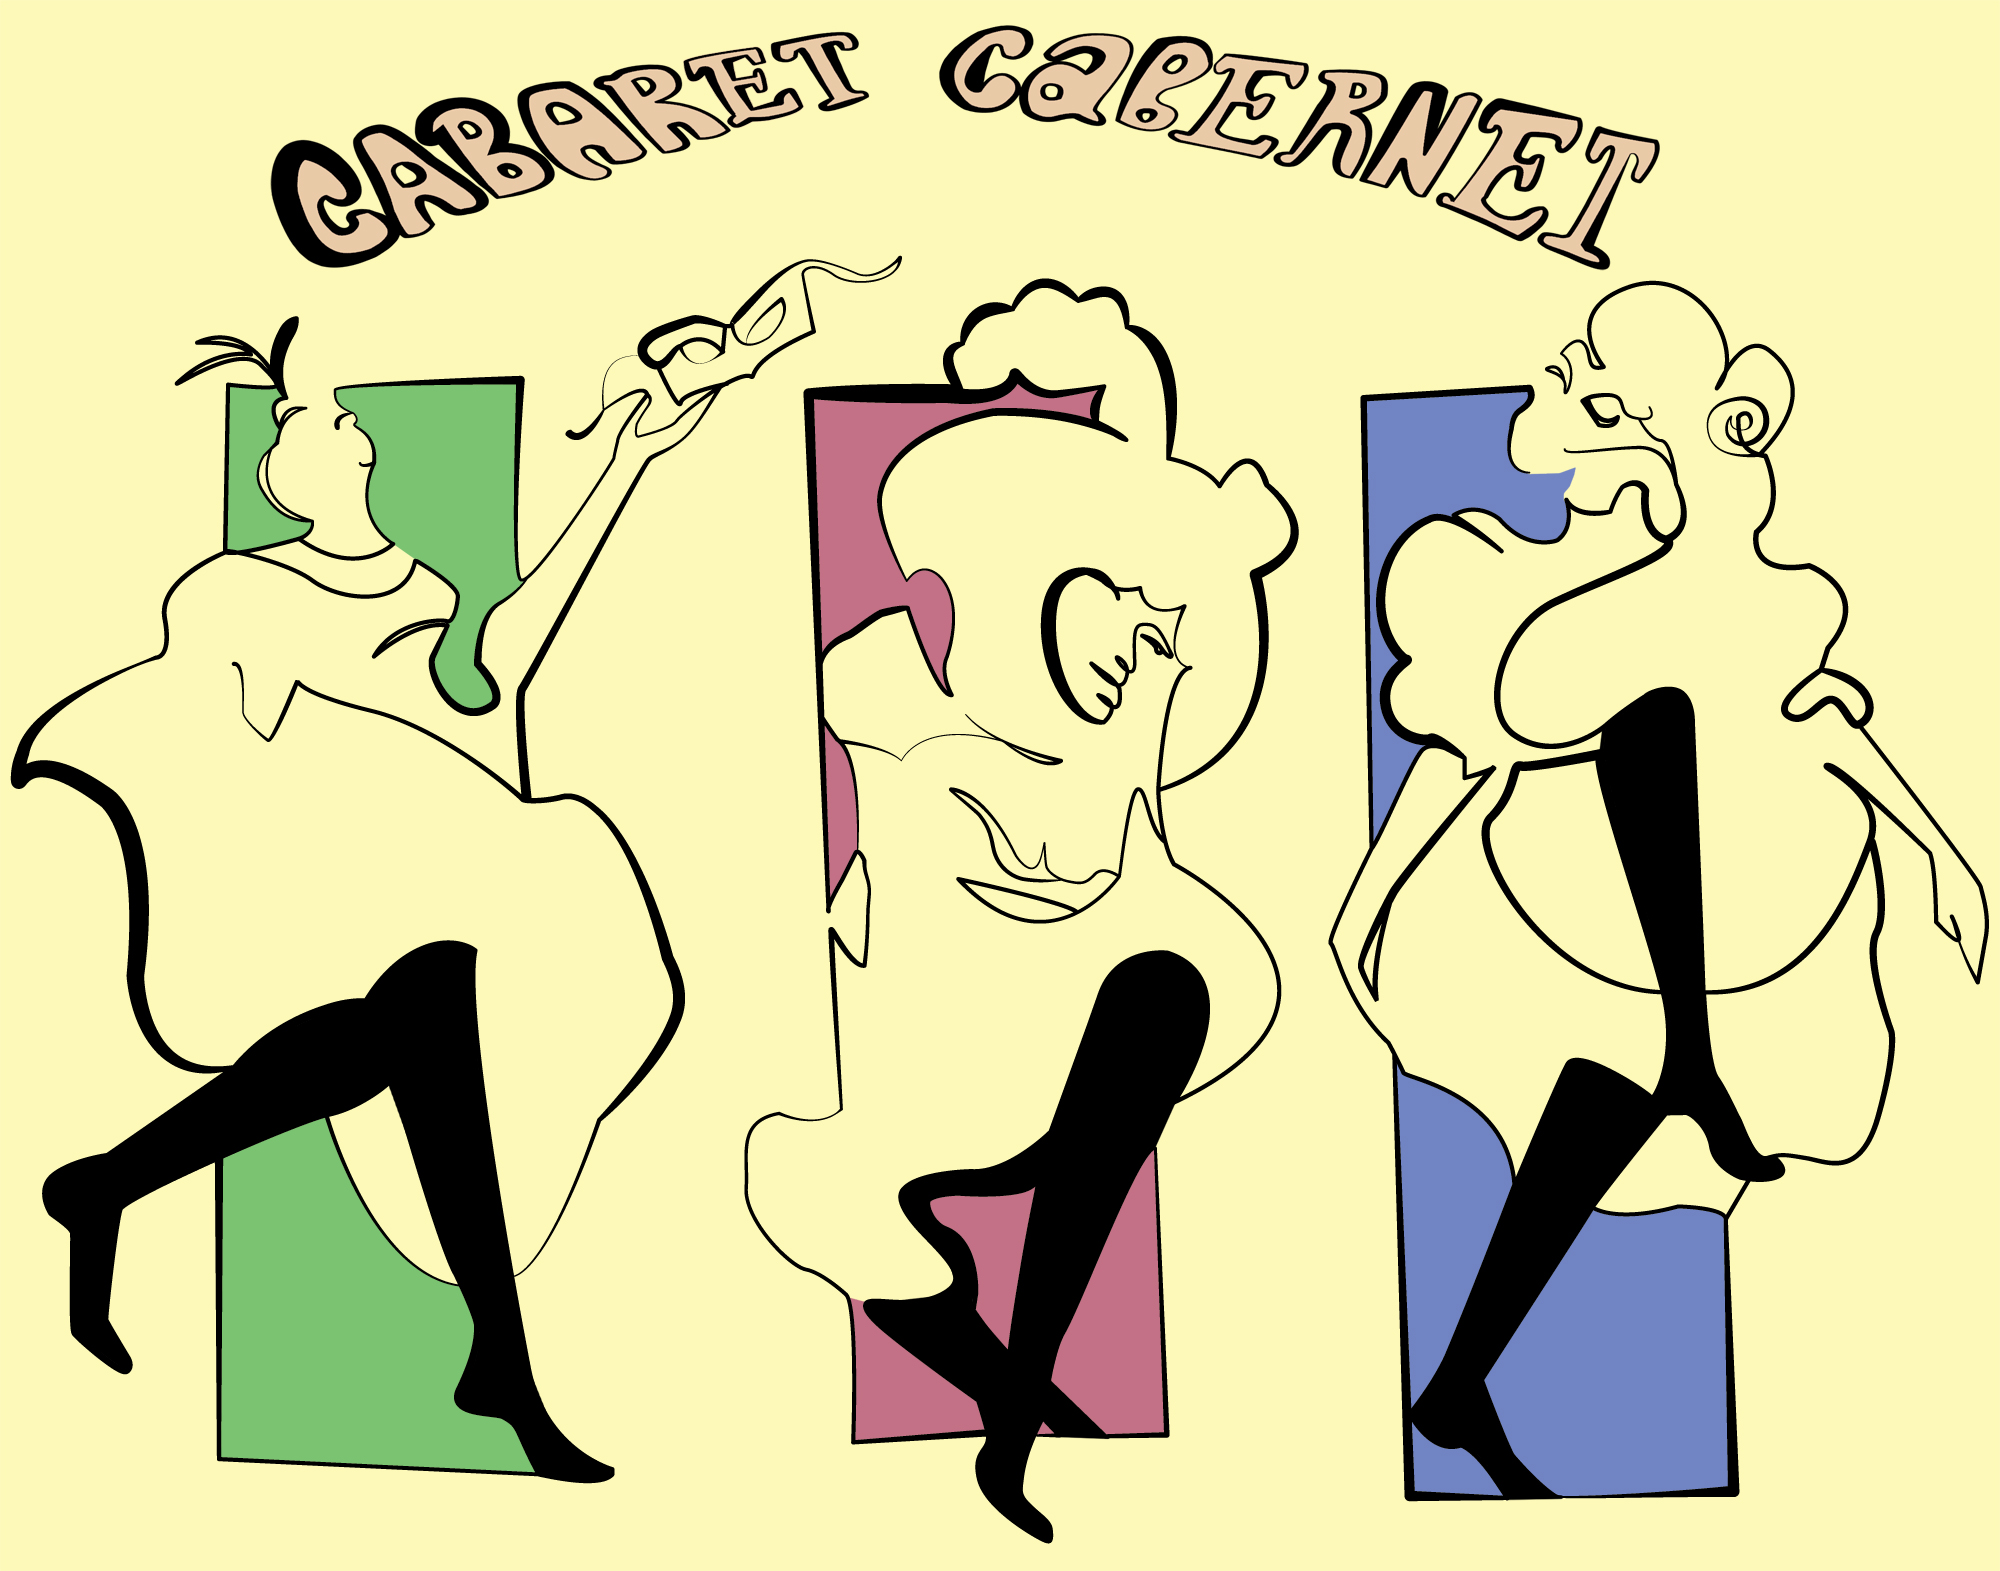 cabaret3 (1) label_small.jpg